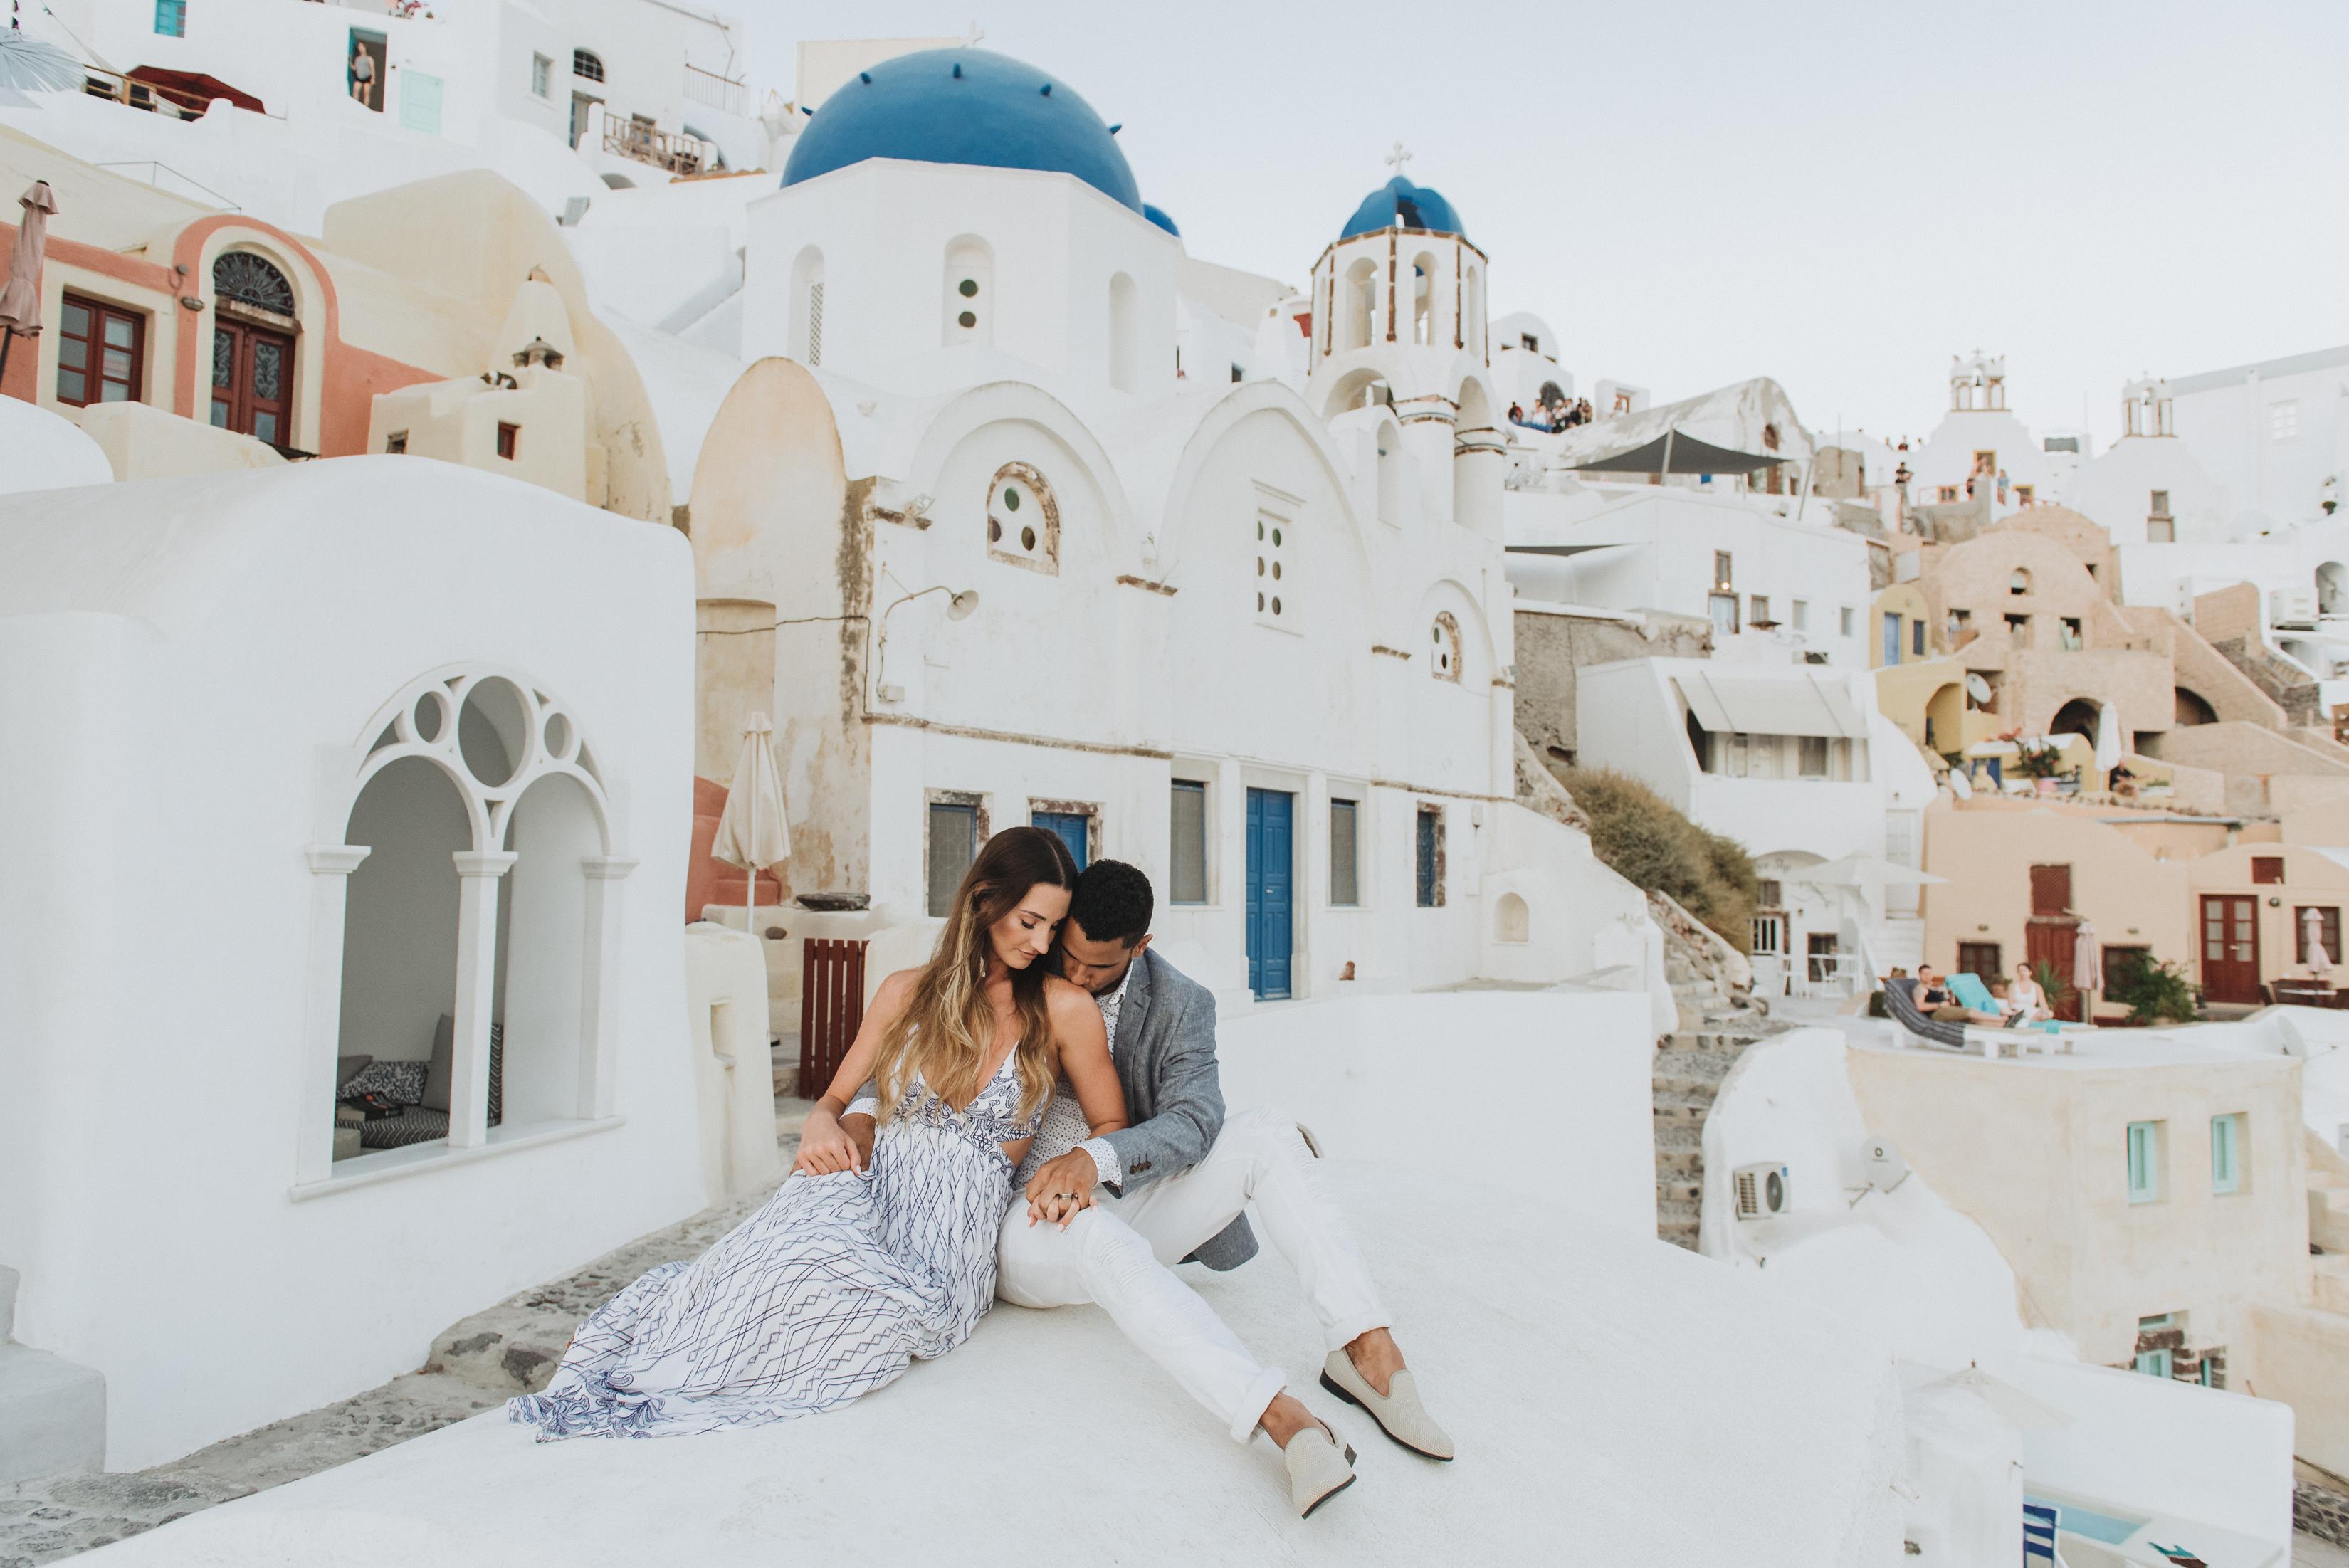 The Top 10 Honeymoon Photos of 2018